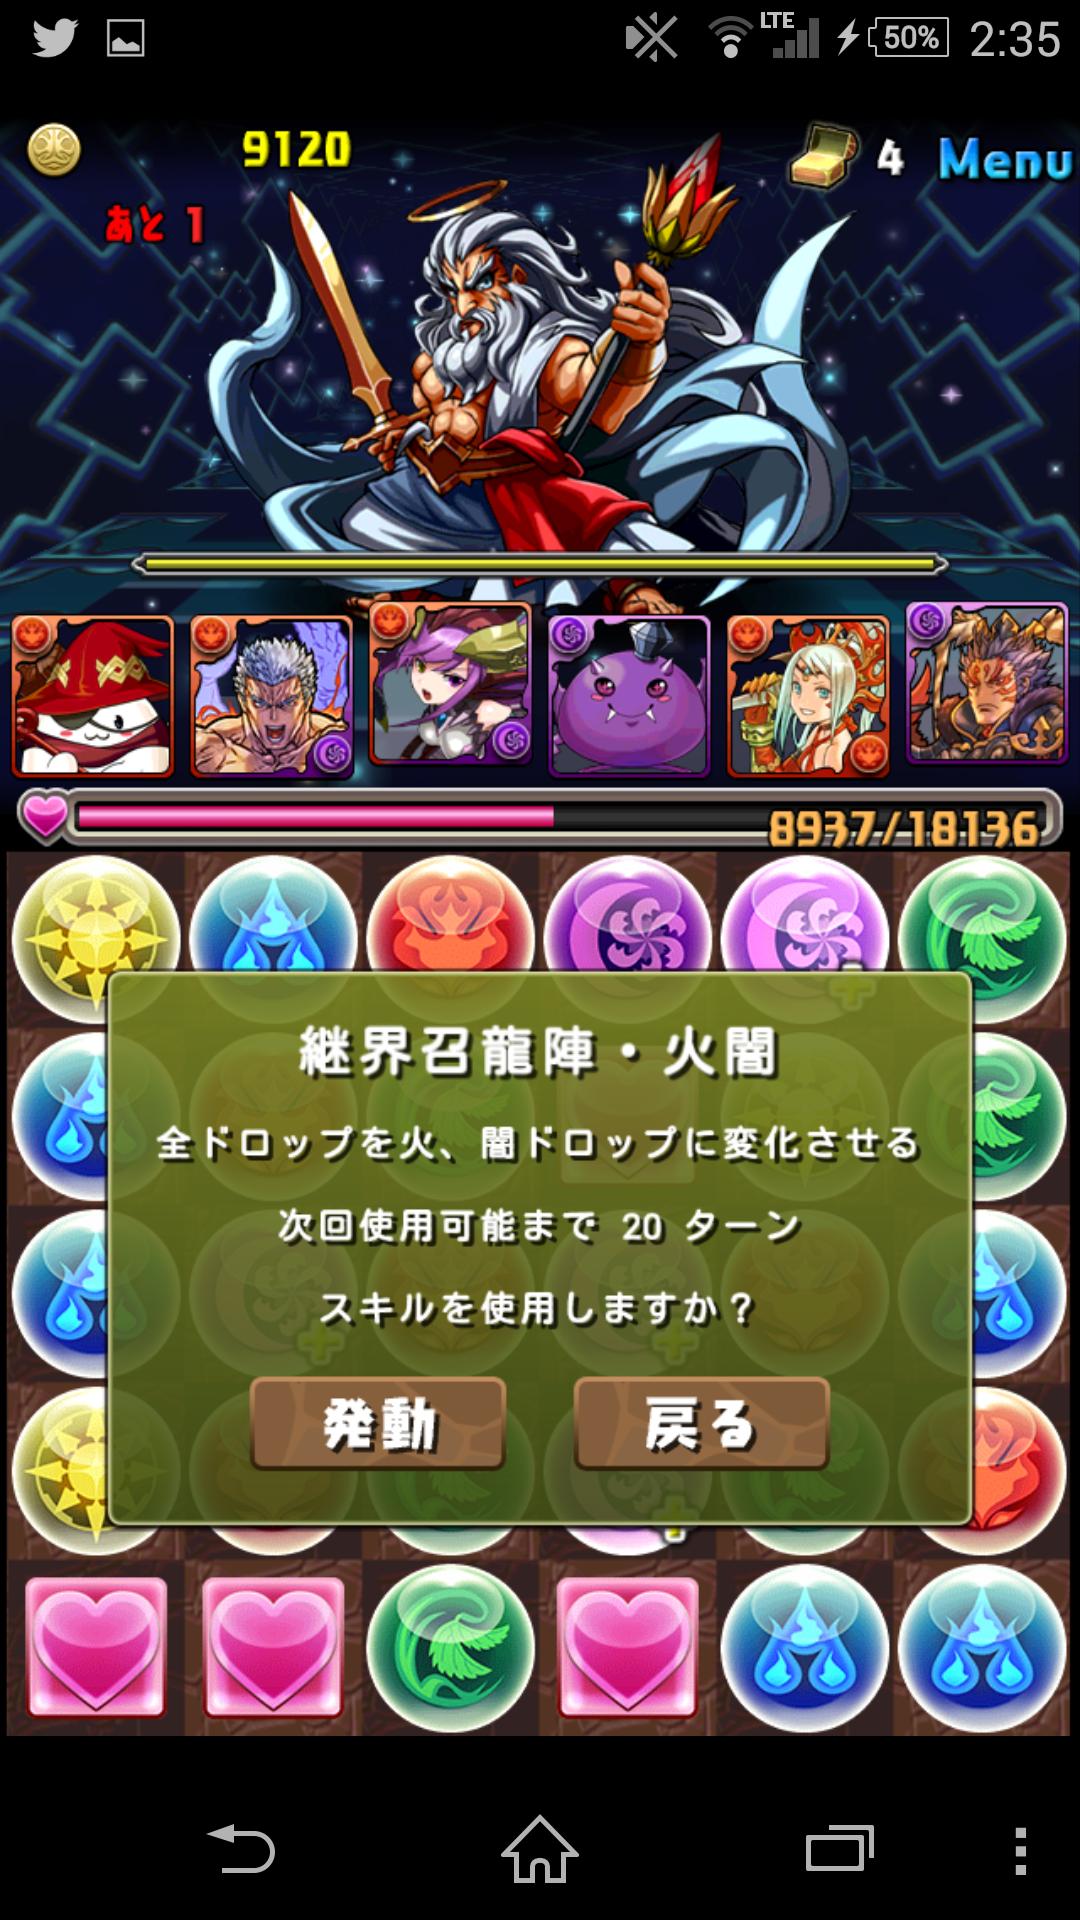 Screenshot_2015-02-18-02-35-49.png